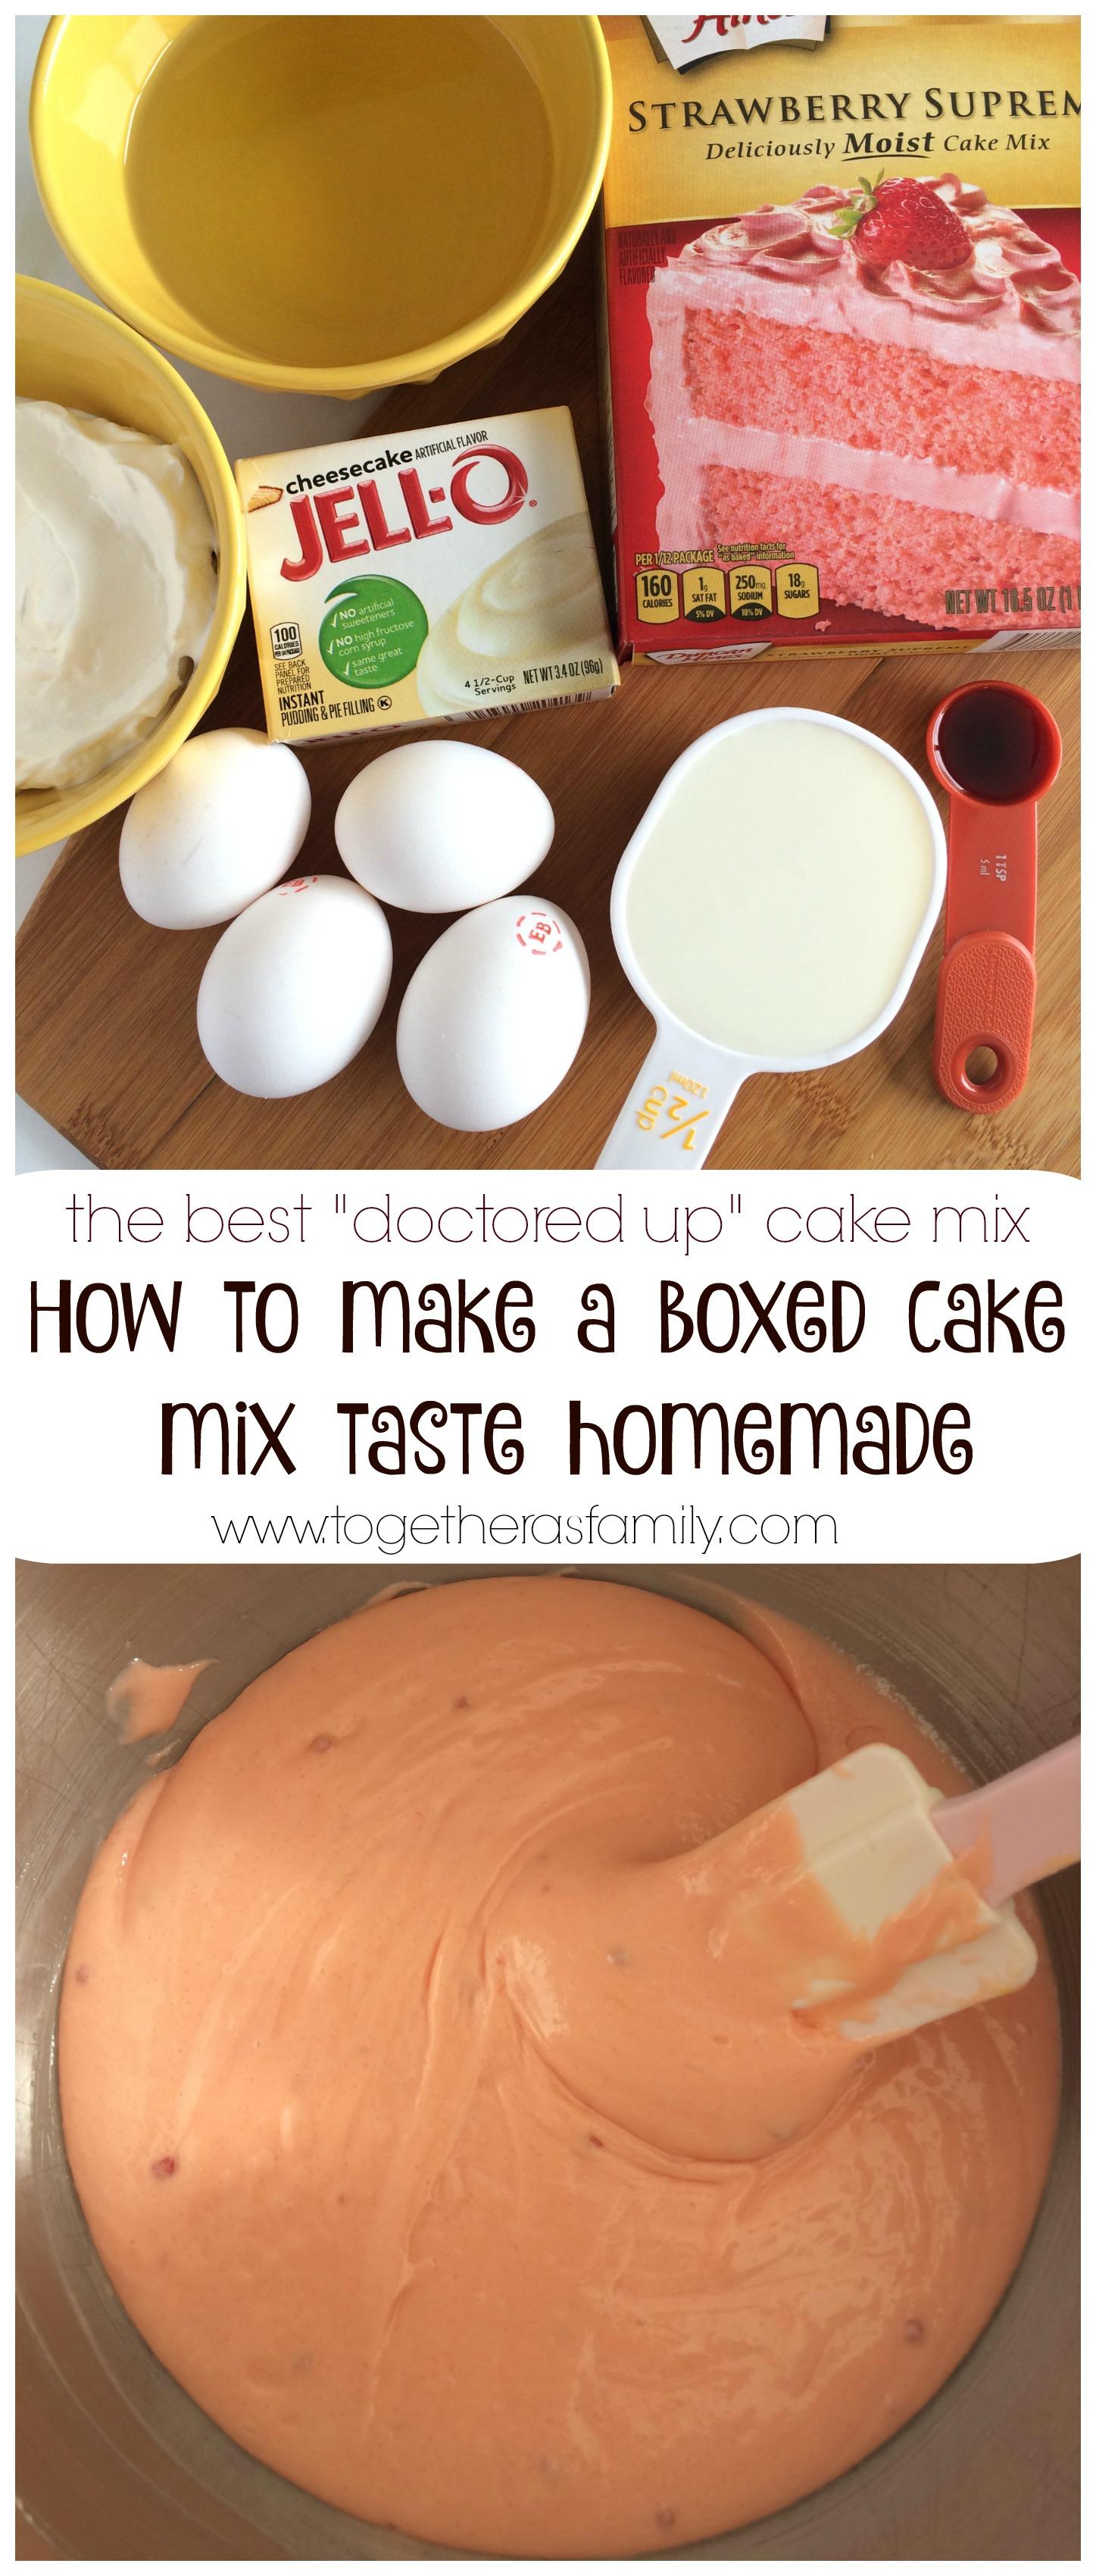 How to make box german chocolate cake taste homemade